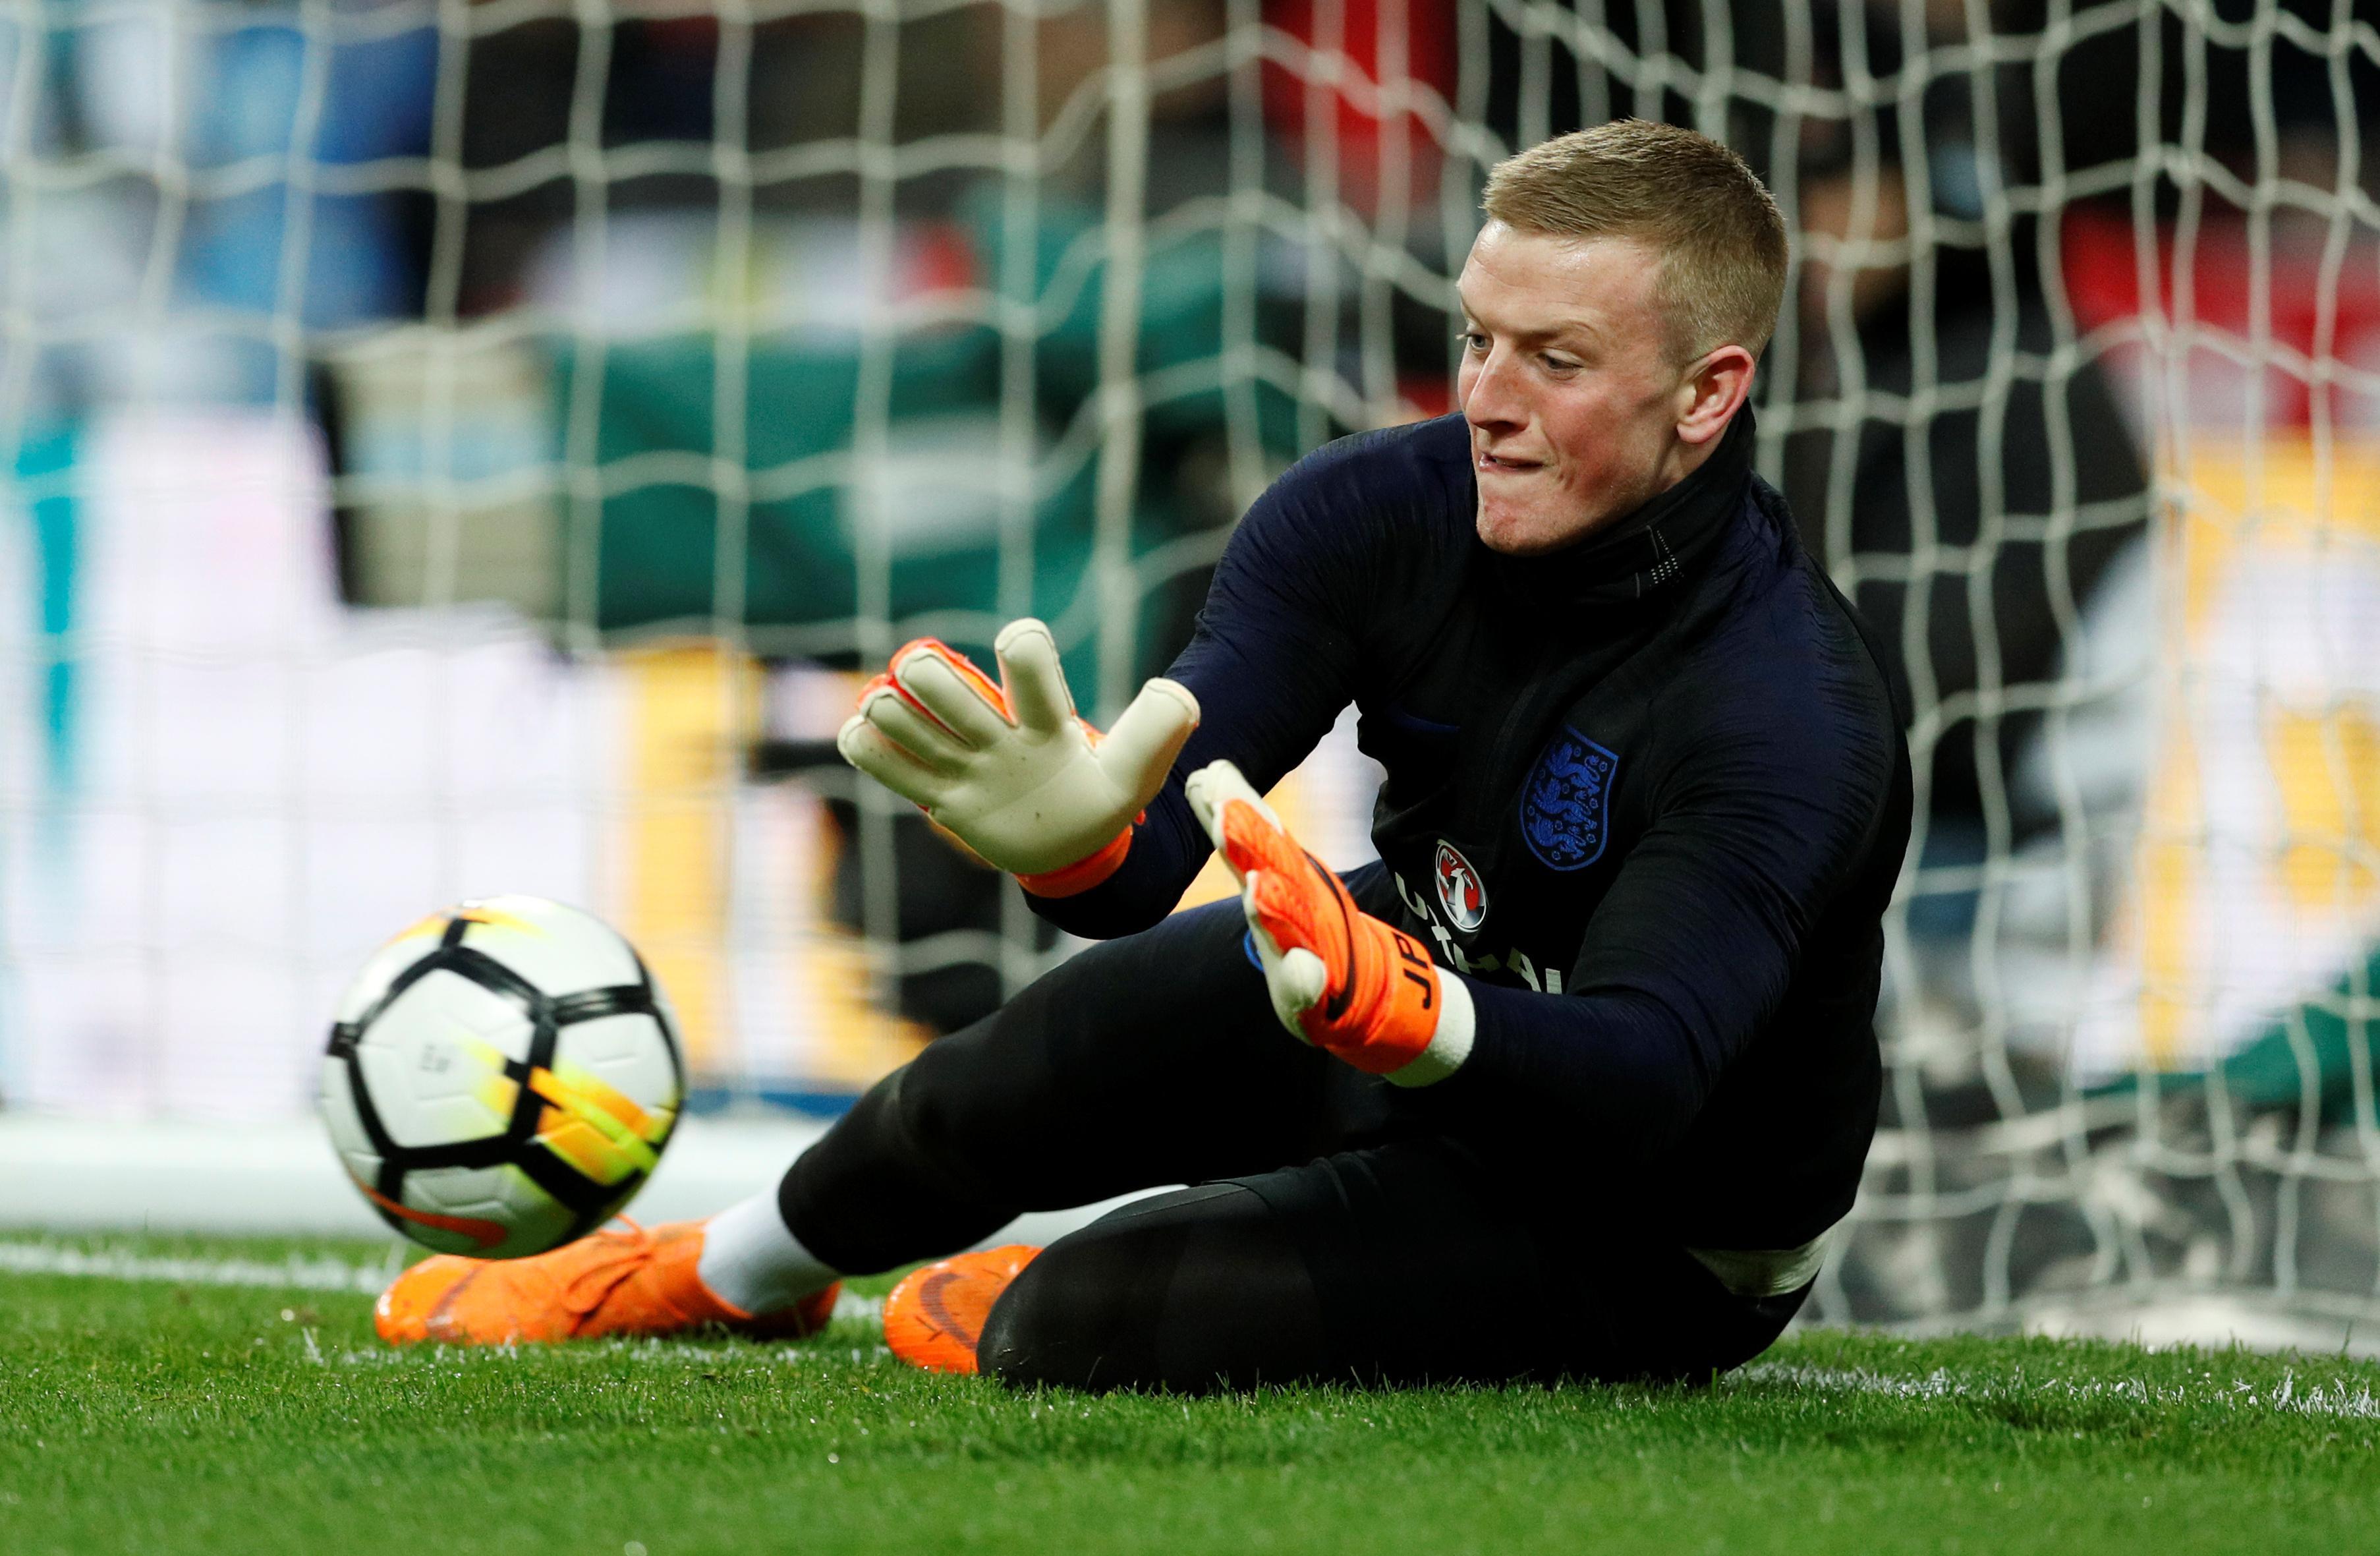 Pickford can be England's World Cup keeper - Allardyce